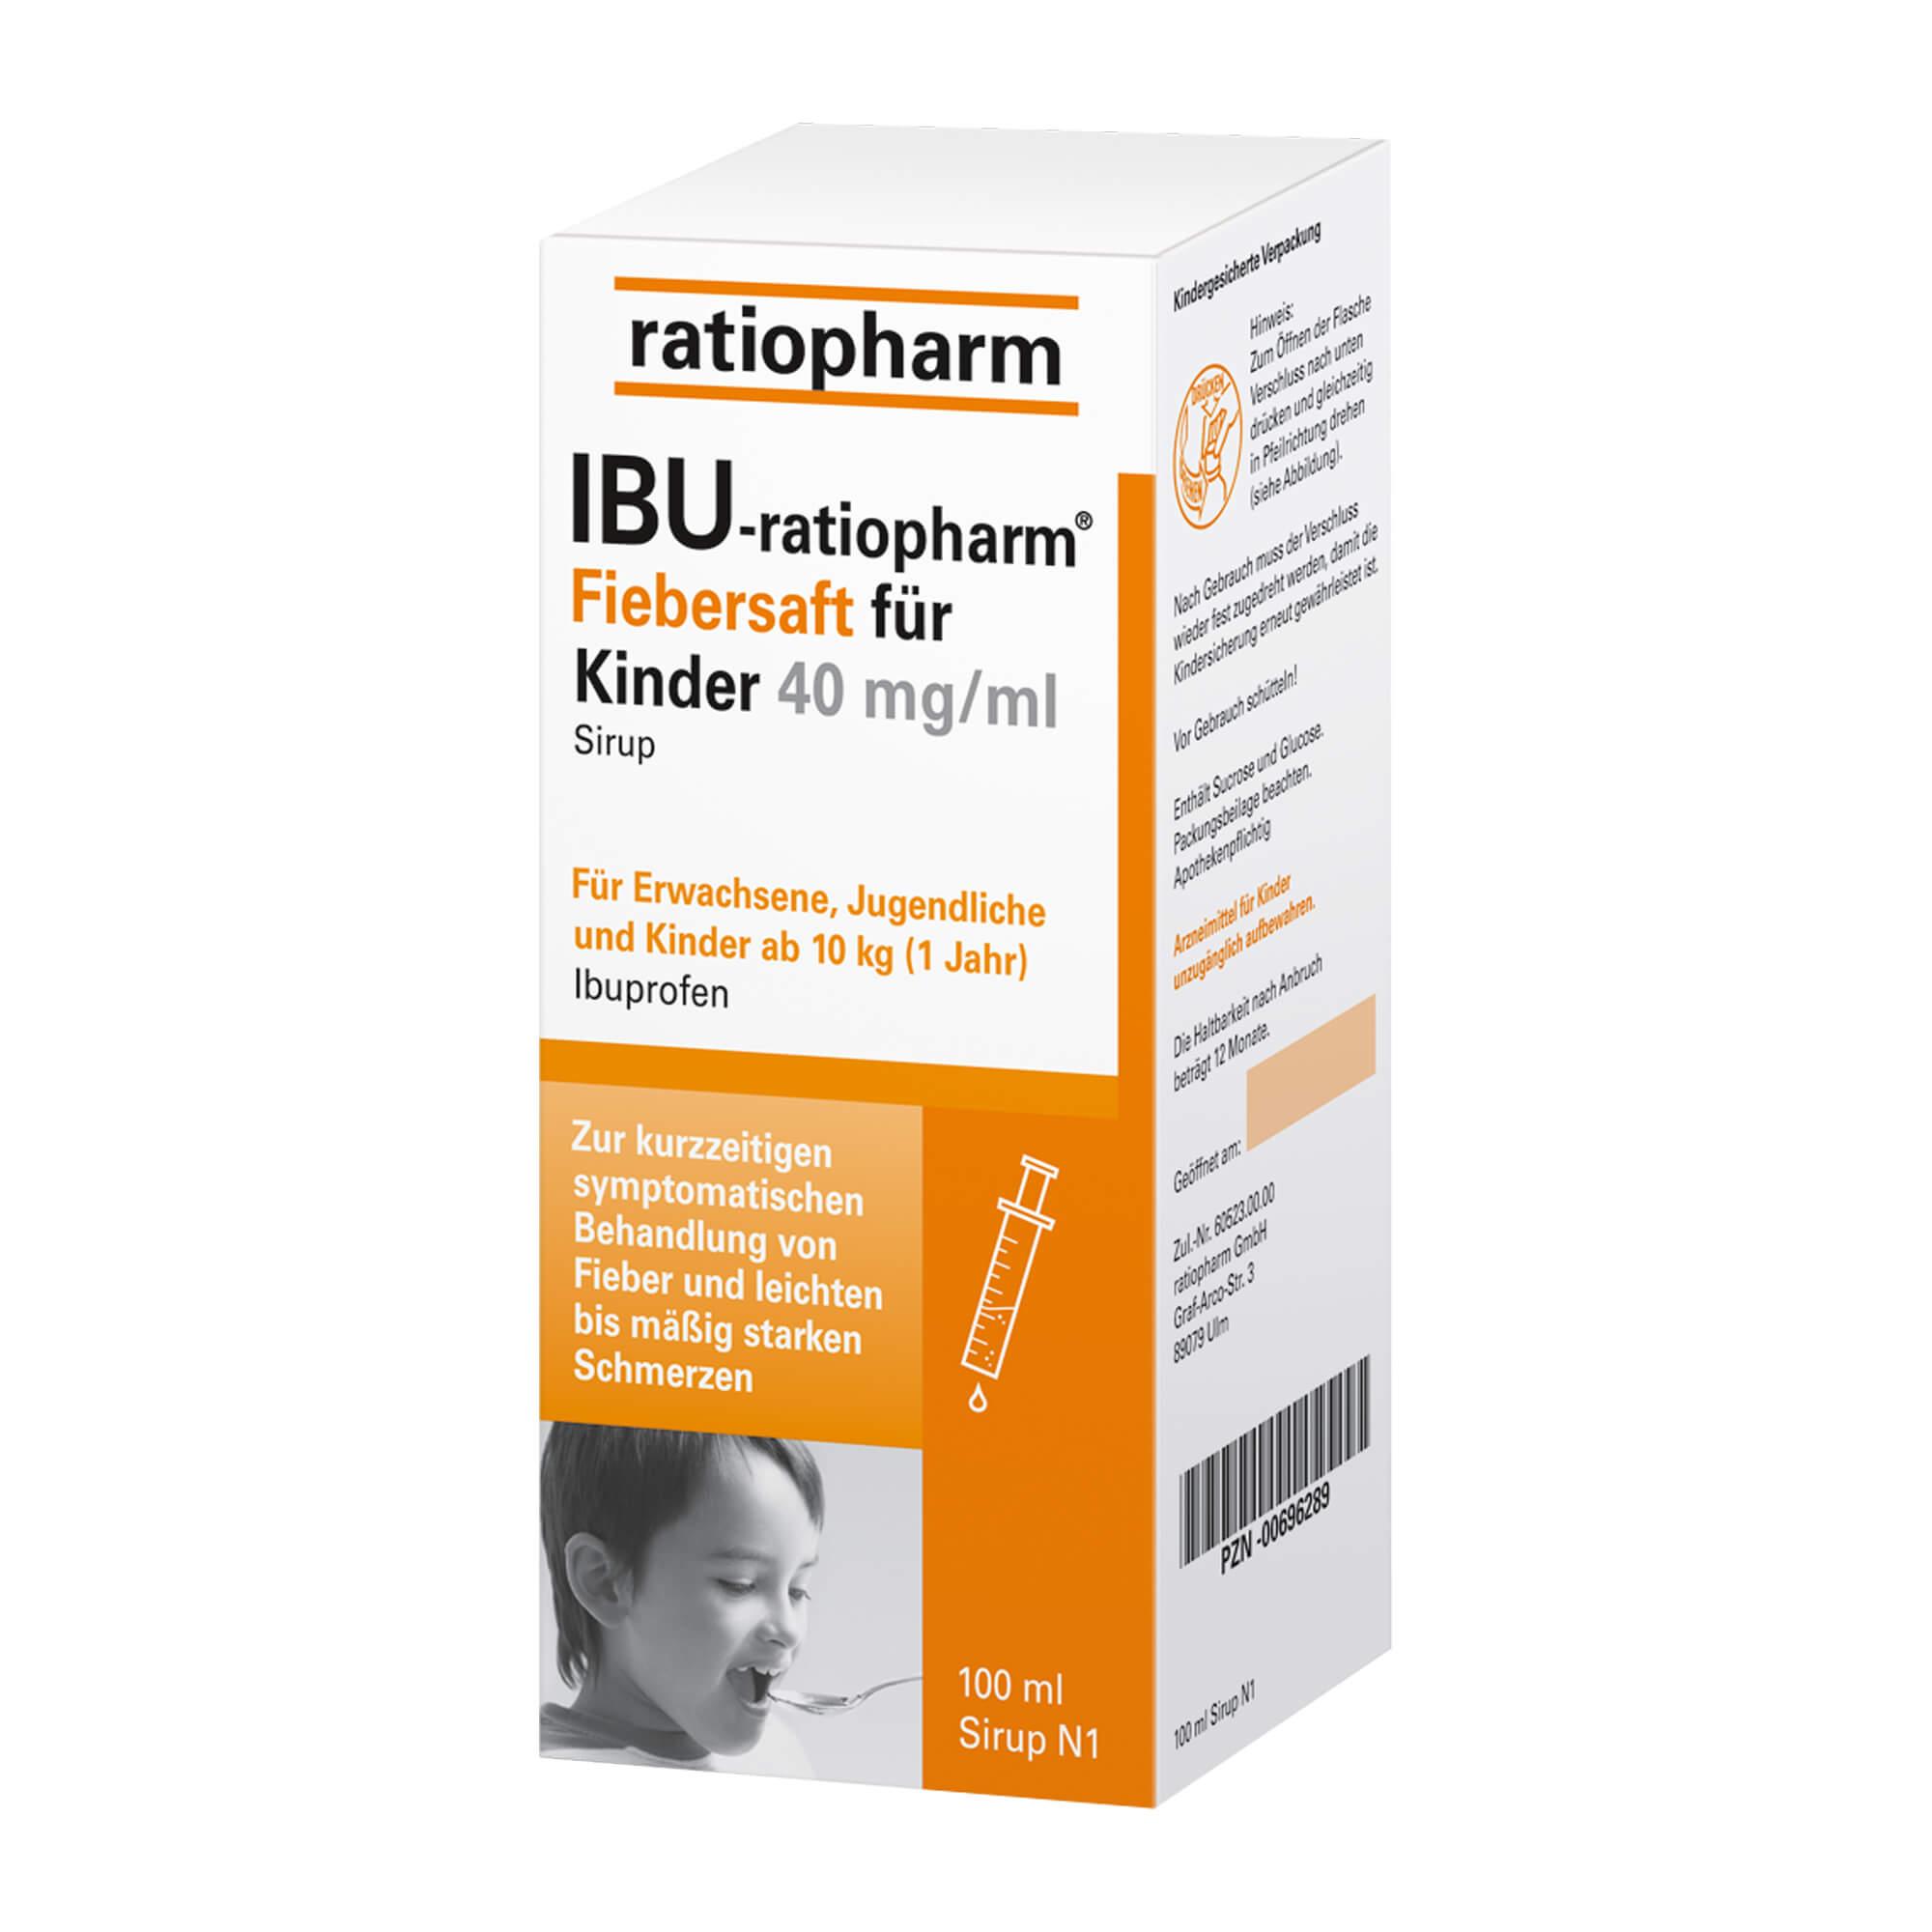 IBU-ratiopharm 4% Fiebersaft für Kinder